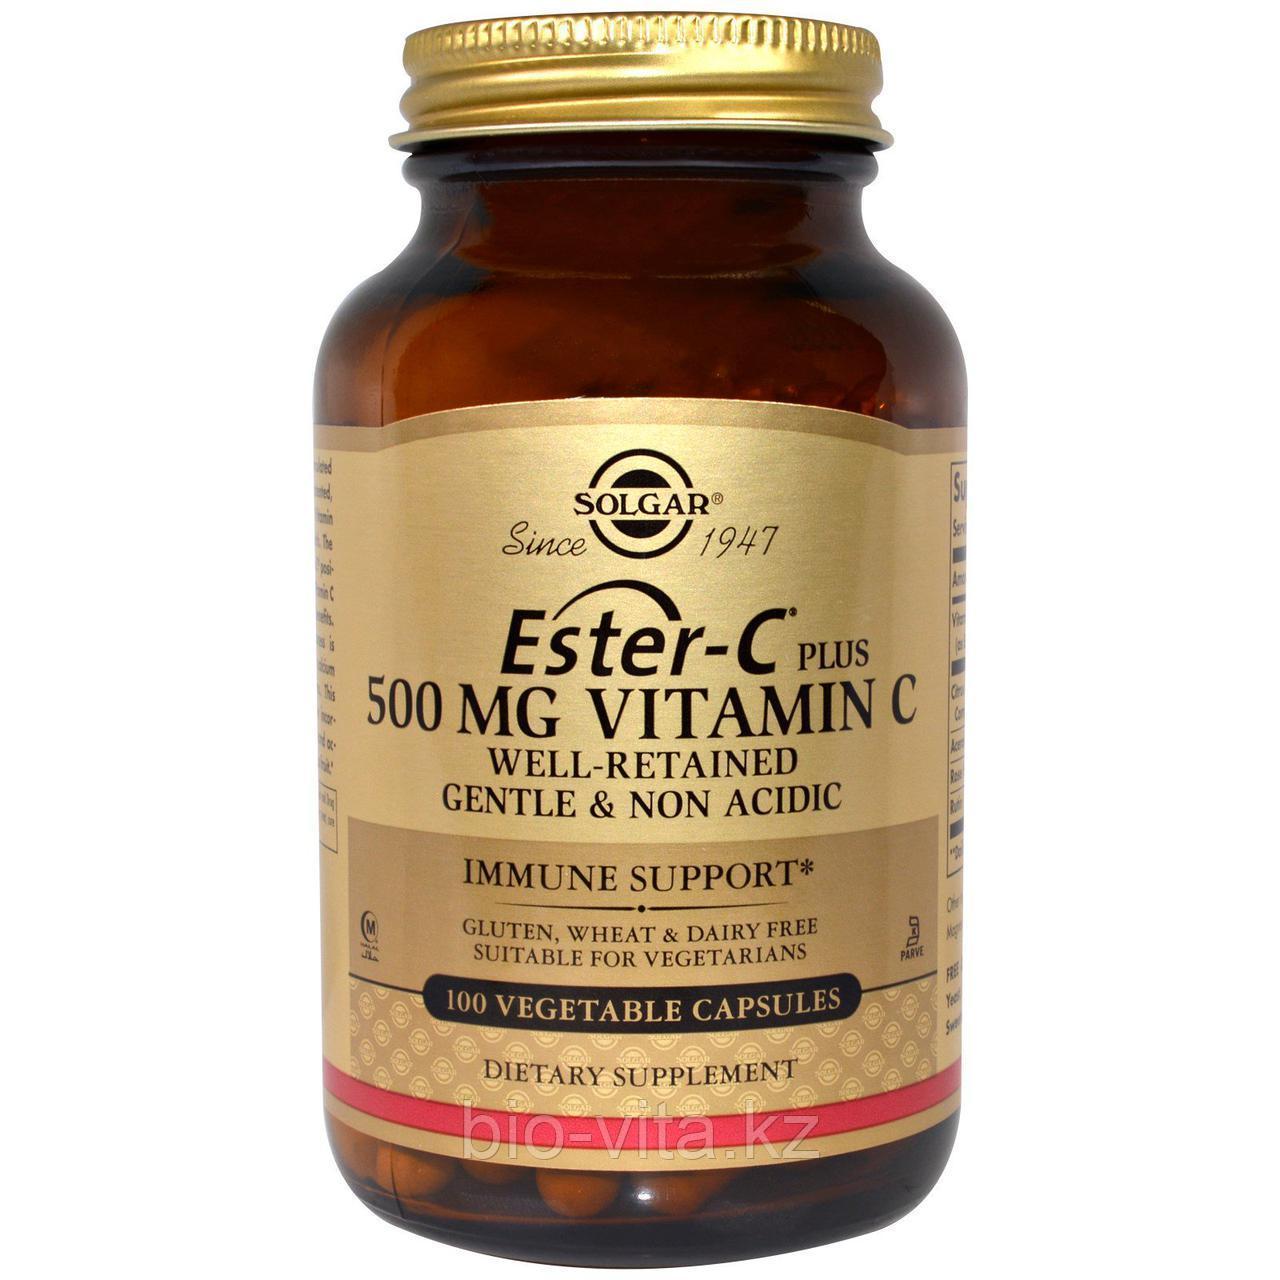 Solgar, Ester-C Plus, 500 мг витамина С, 100 таблеток.